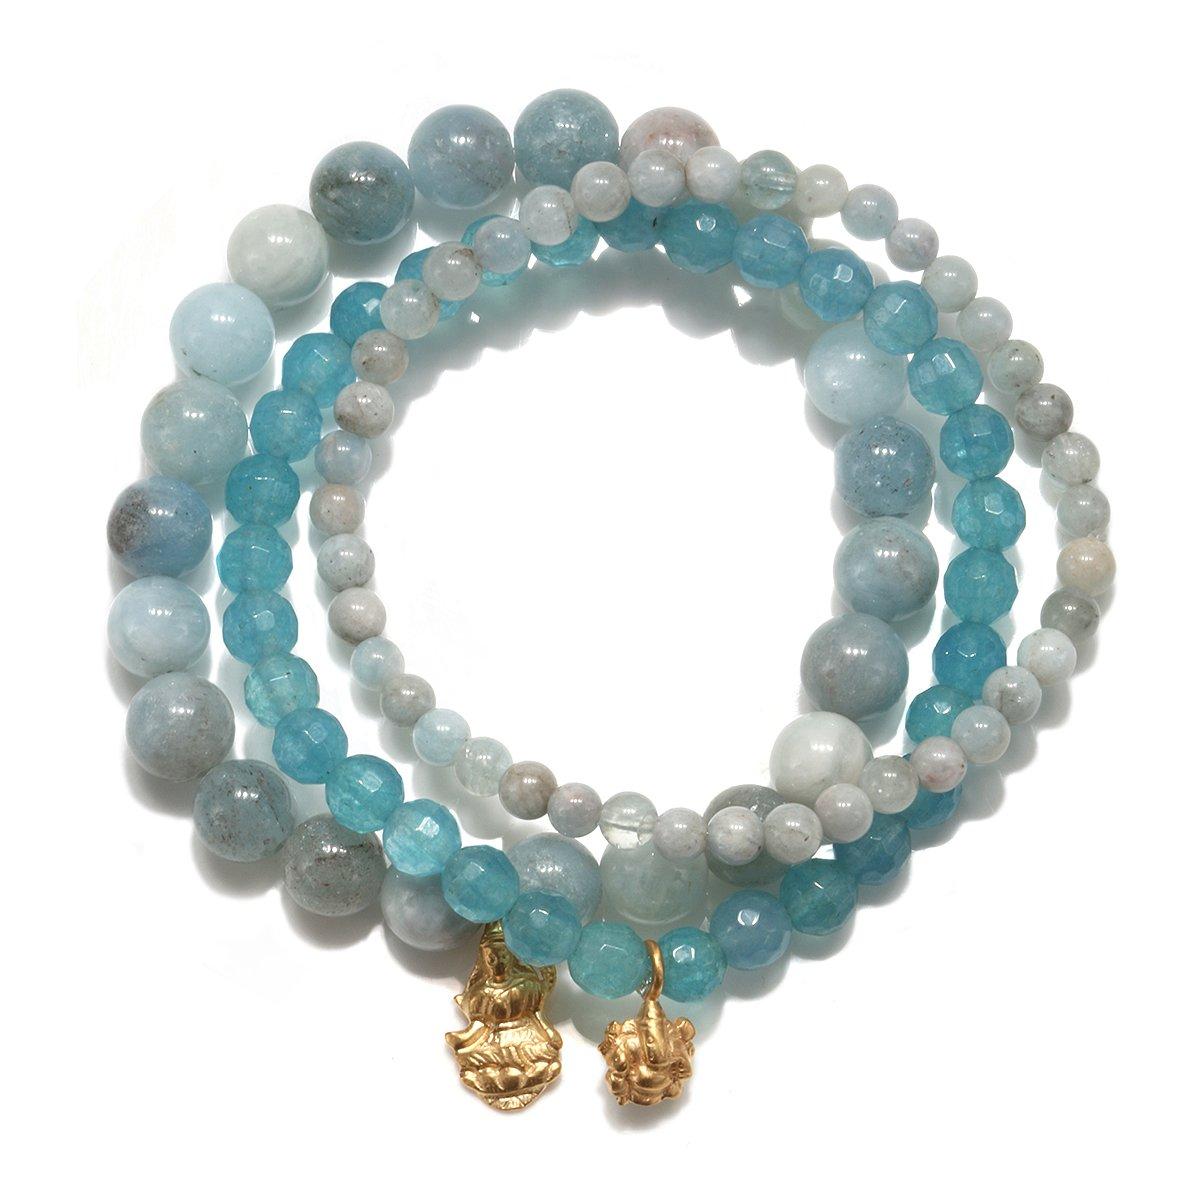 Satya Jewelry Womens Aquamarine Gold Ganesha Lakshmi Stretch Bracelet Set, Blue, One Size